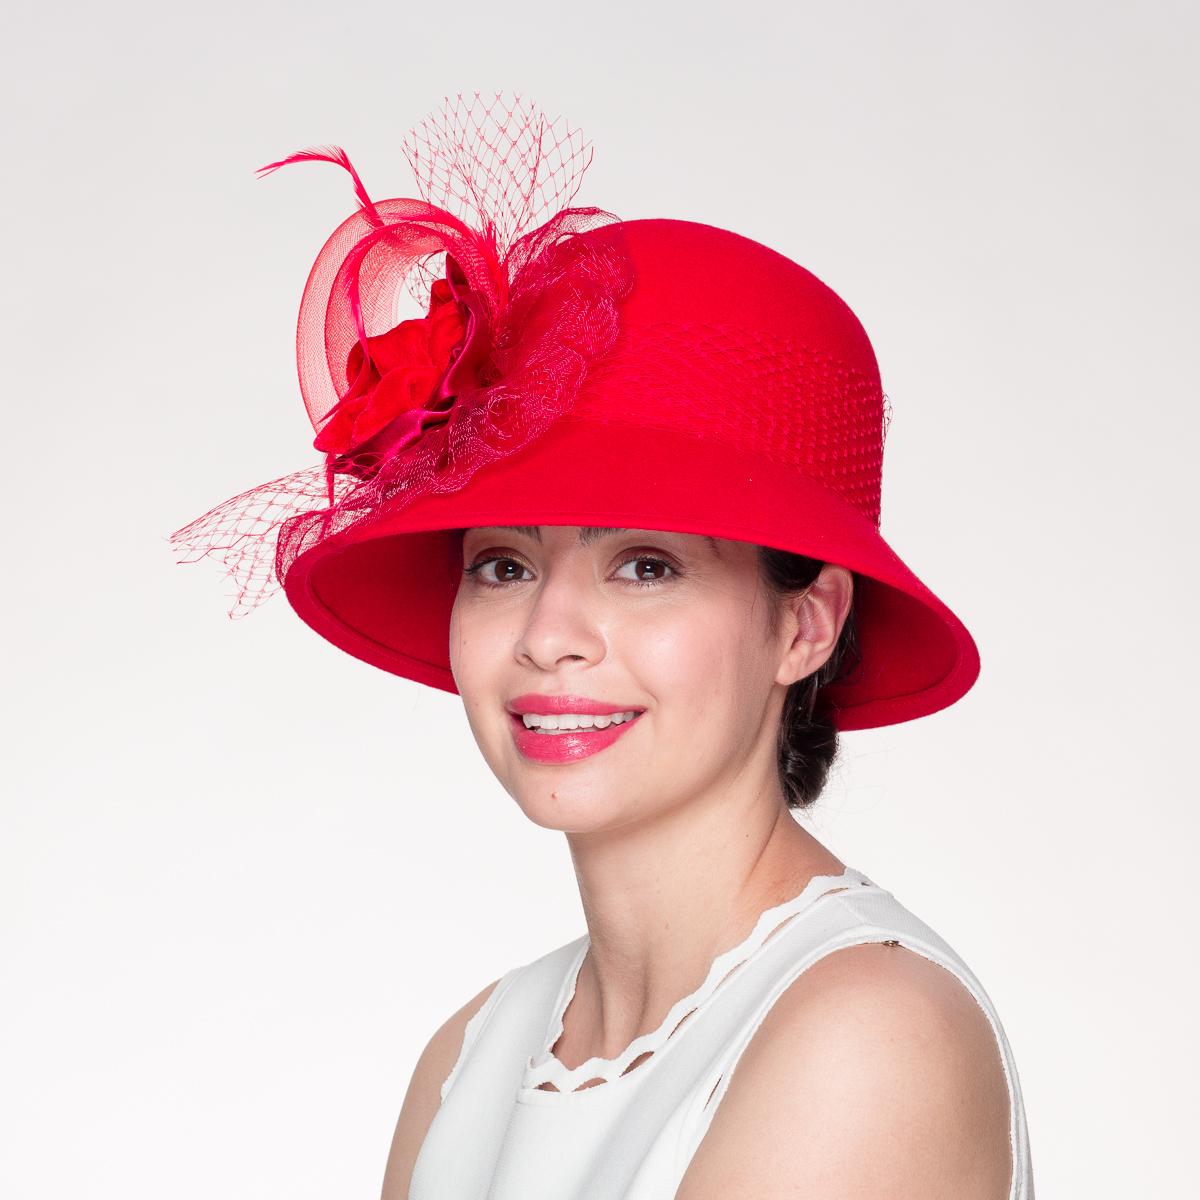 Wedding Dress Preservation Uv Protected: Red Velvet Cin Bow Cloche Wool Felt Women's Dress Hats